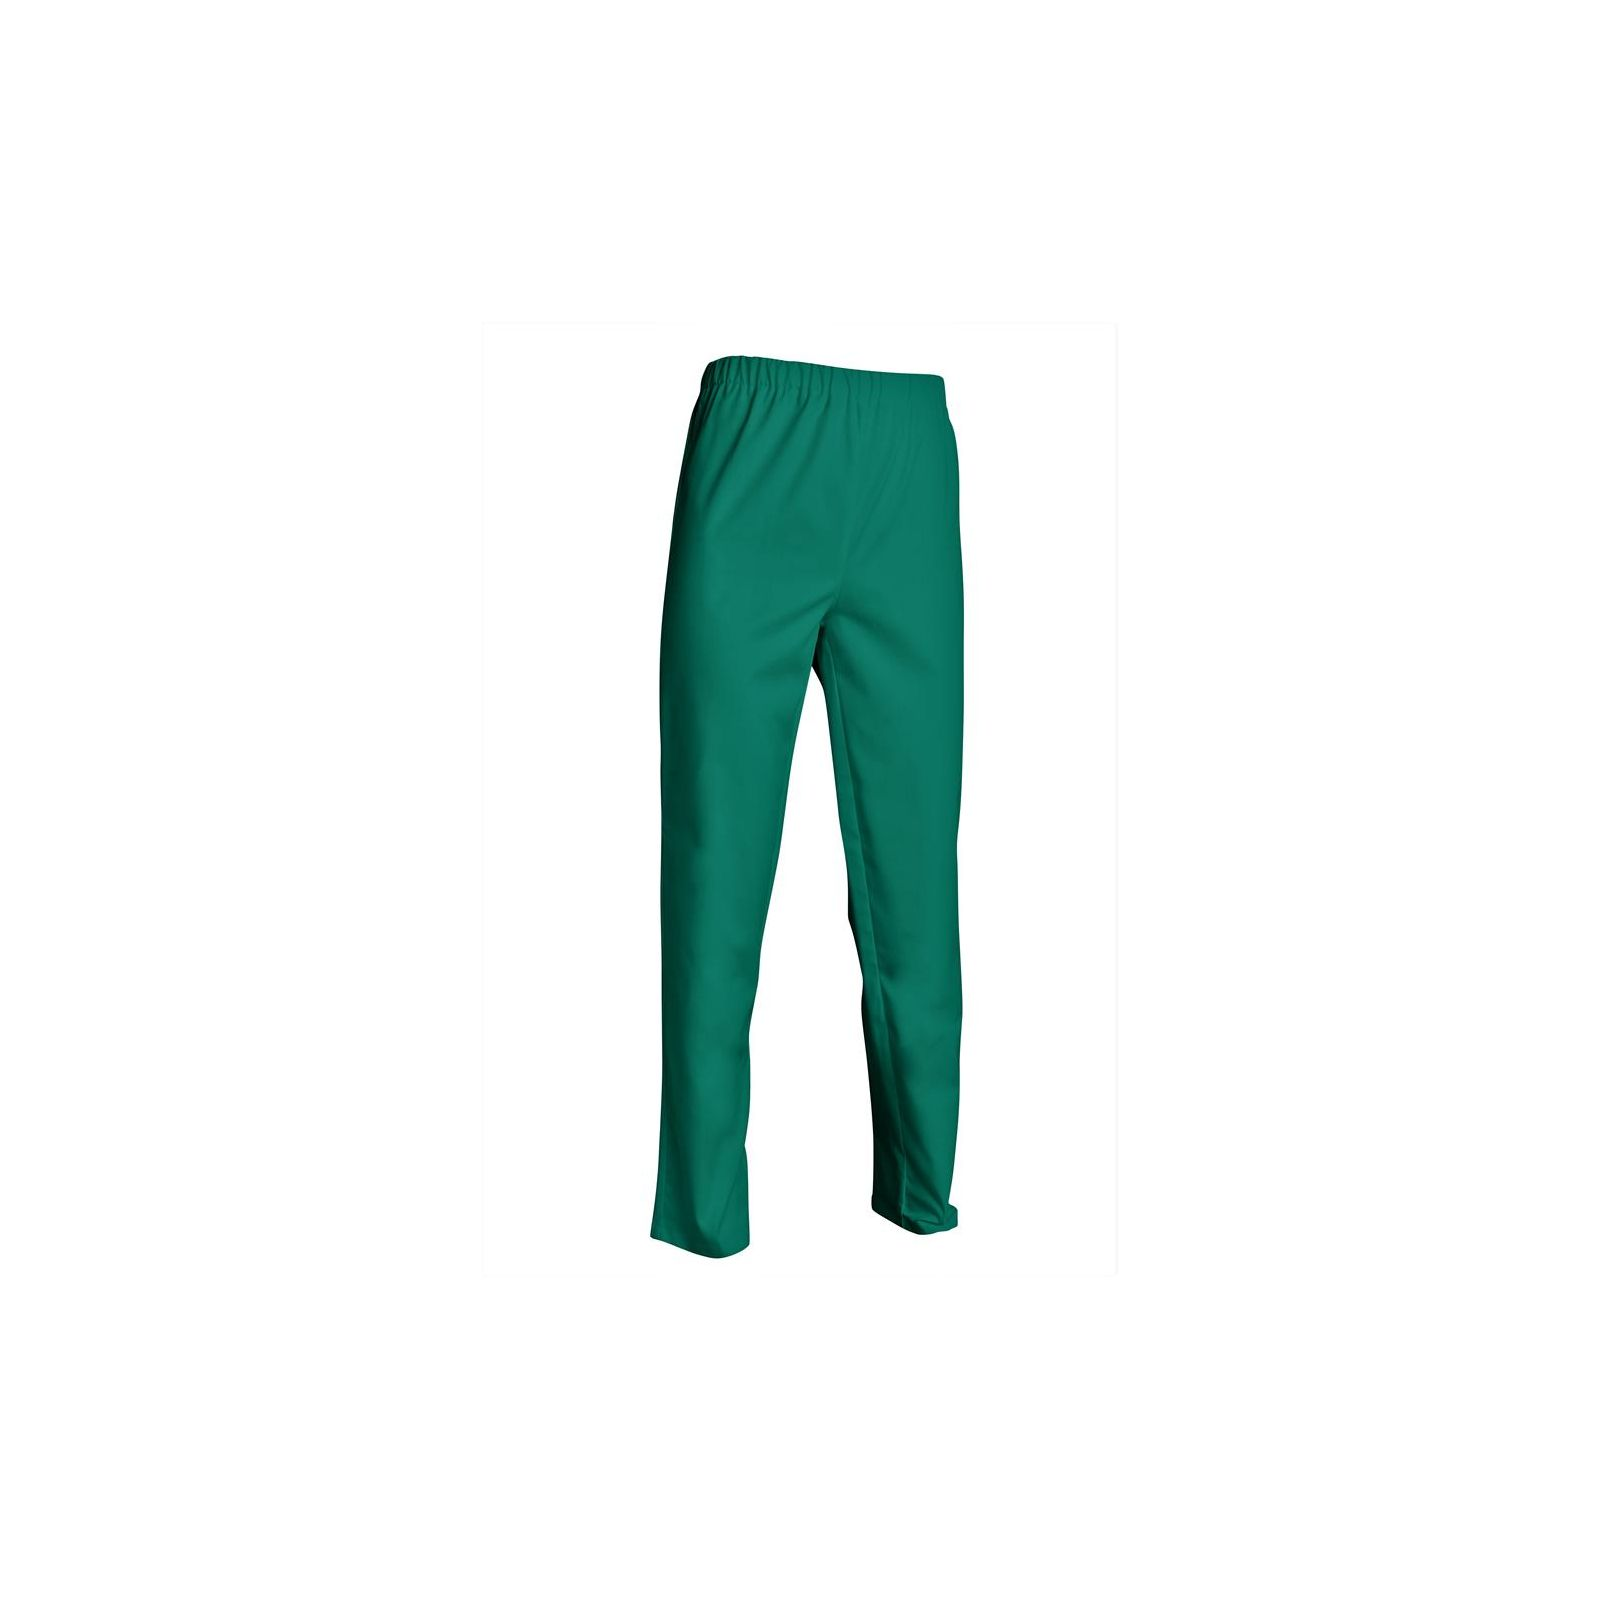 Pantalon médical couleur Unisexe, SNV (ADLX000) vert emeraude